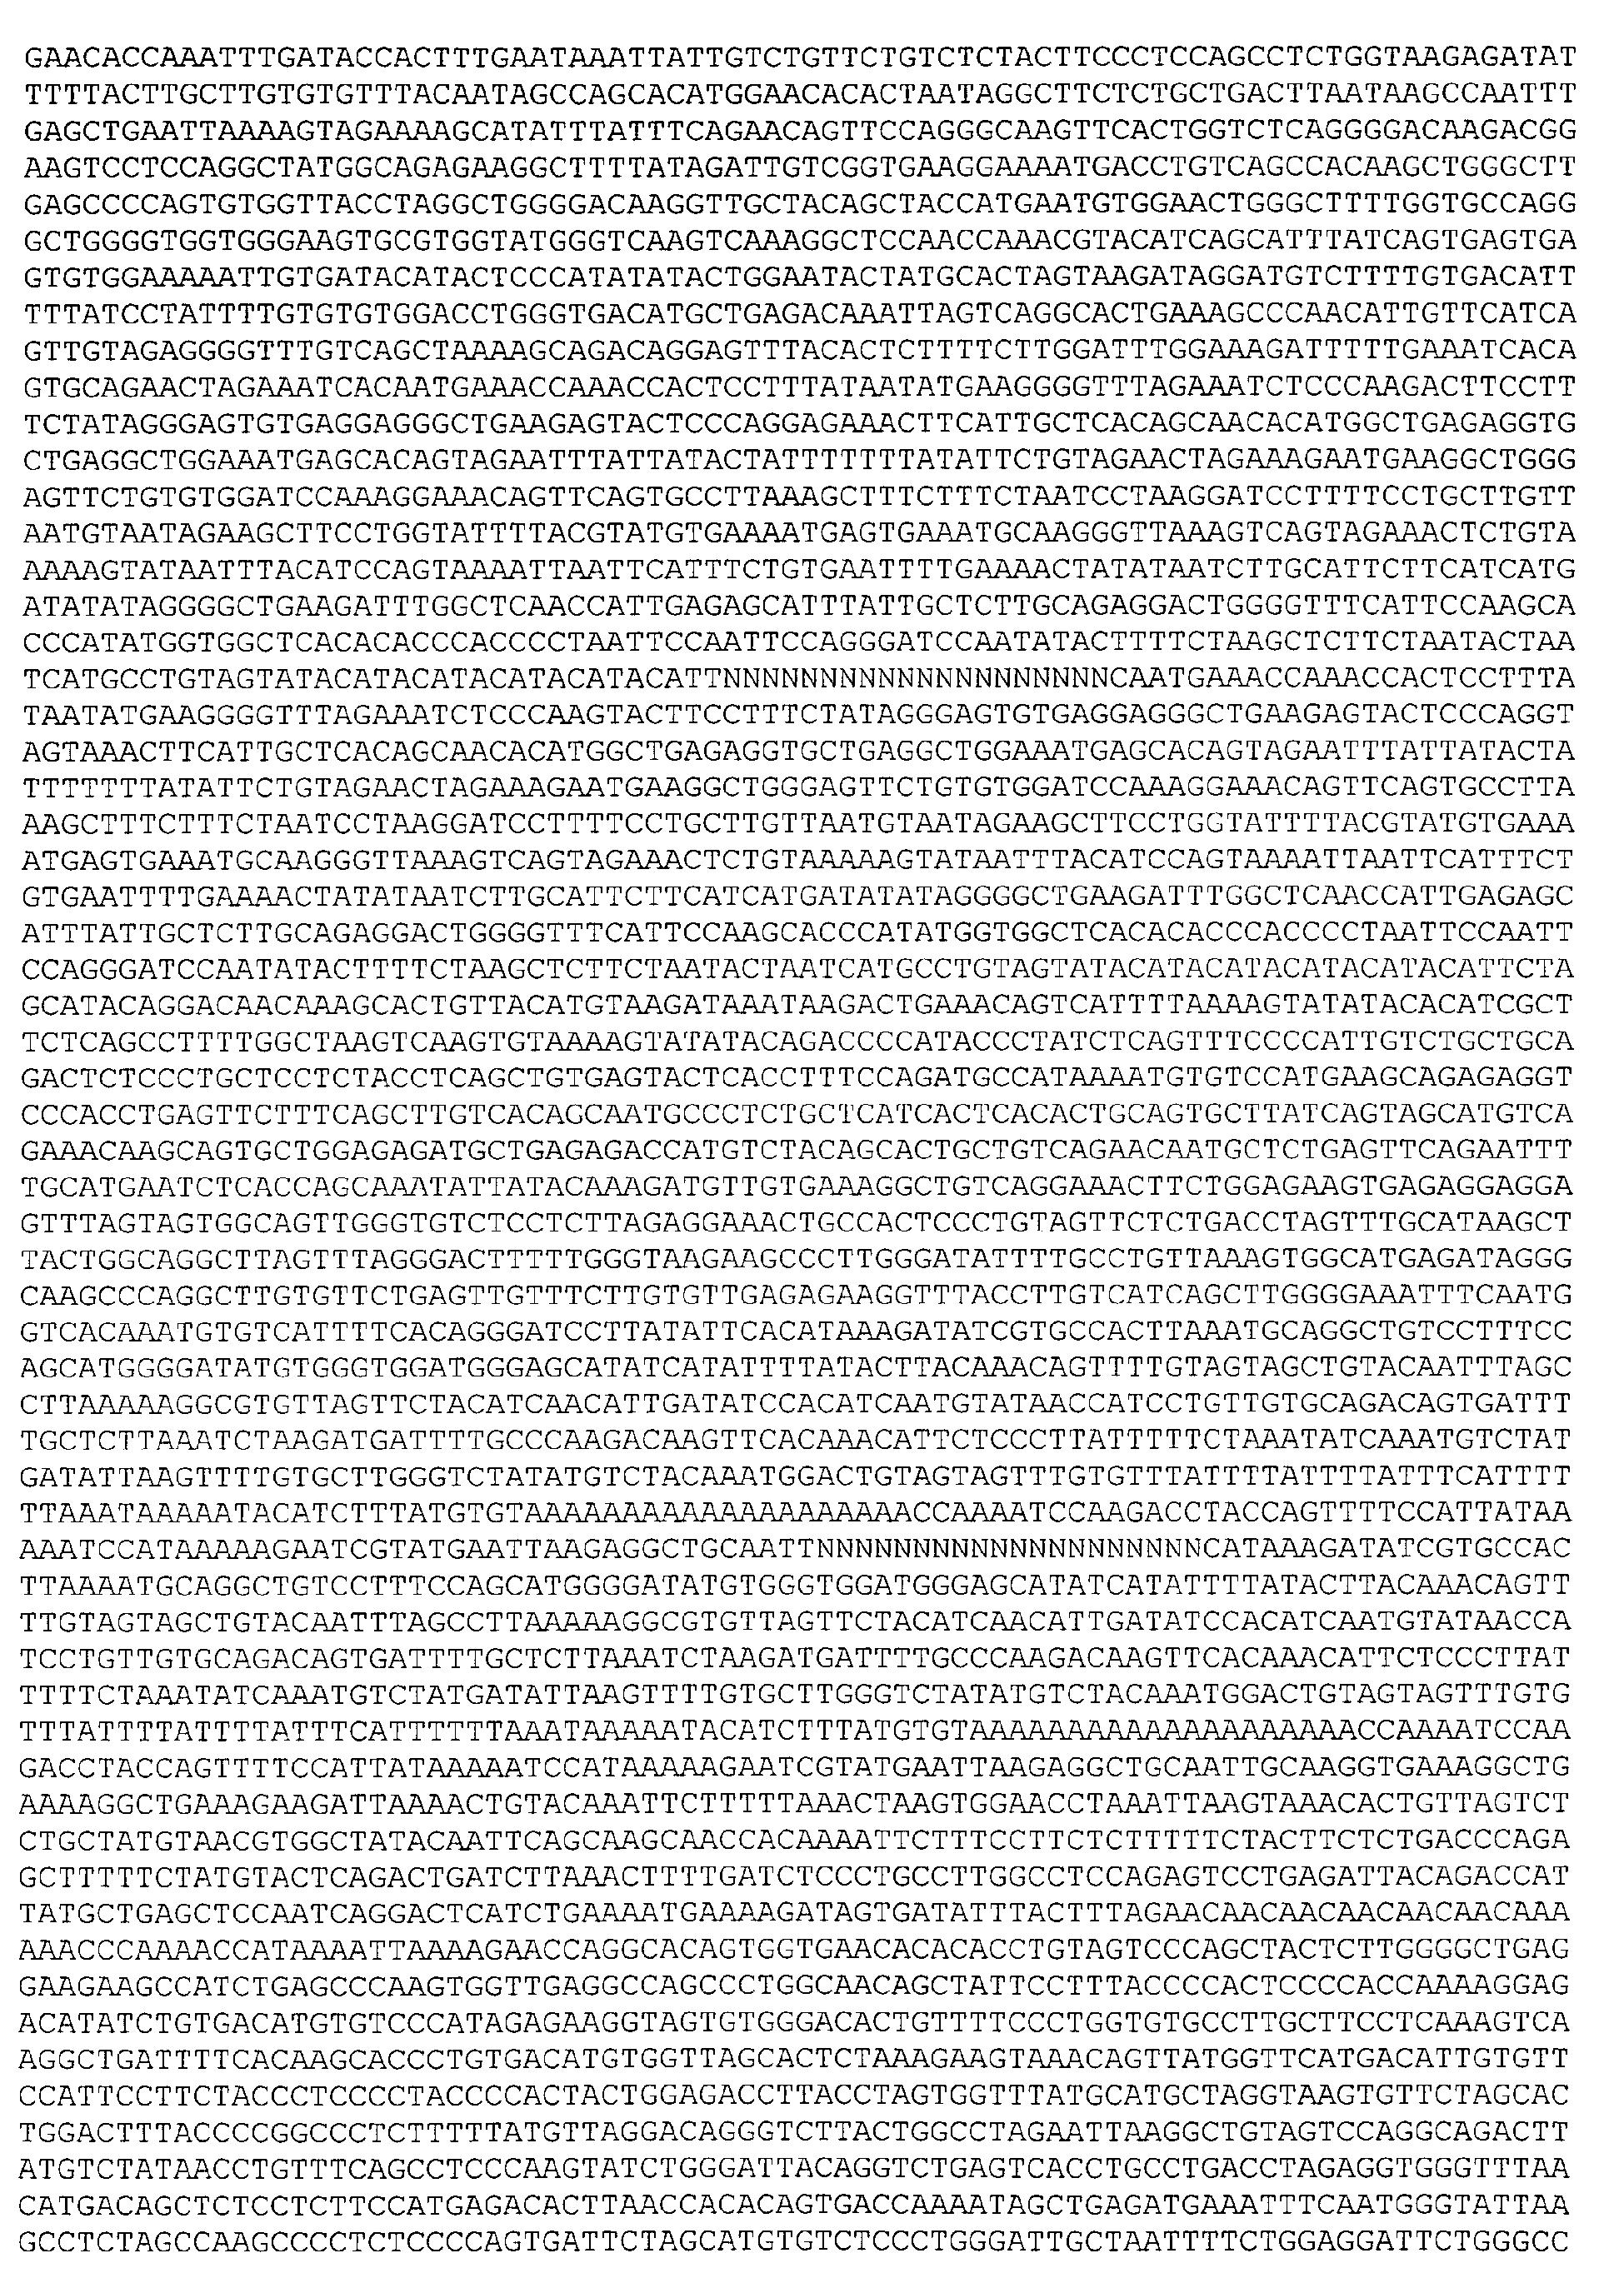 Figure imgb0338